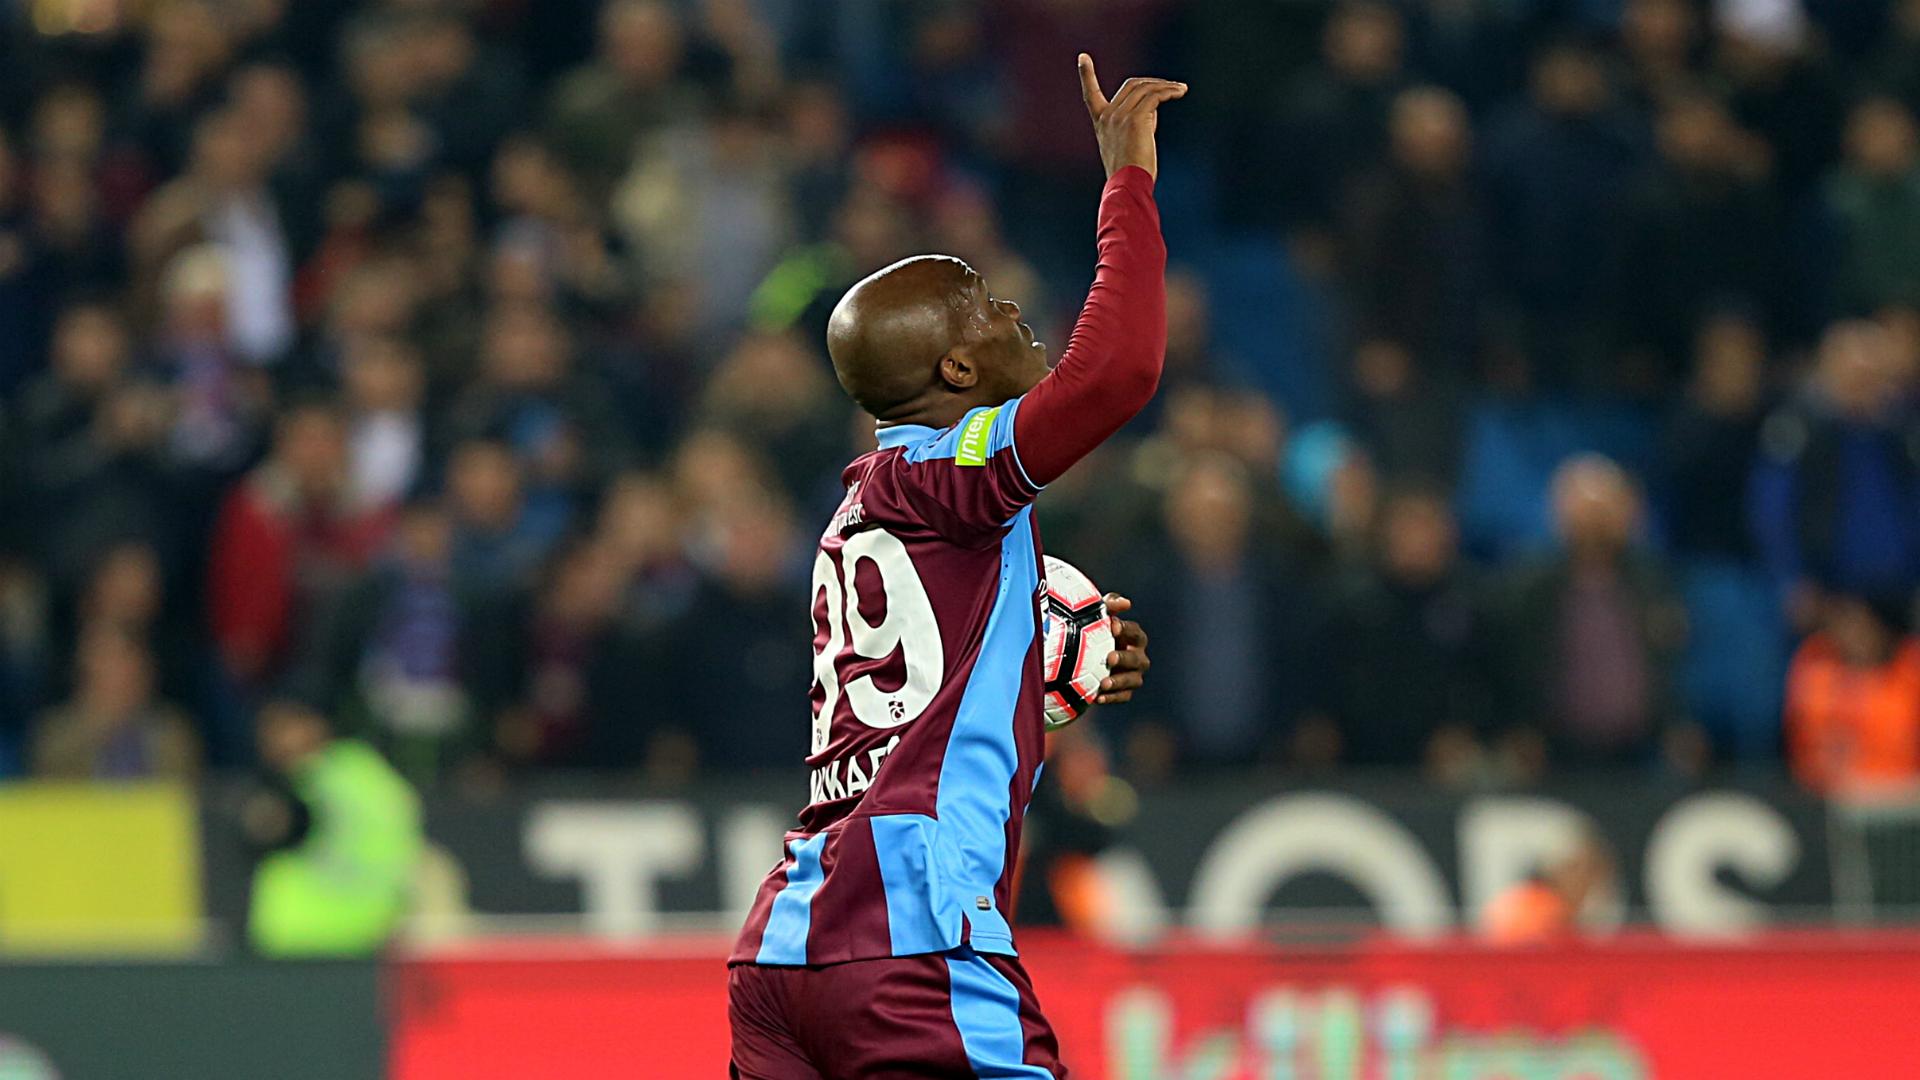 Trabzonspor Antalyaspor Anthony Nwakaeme 05042019